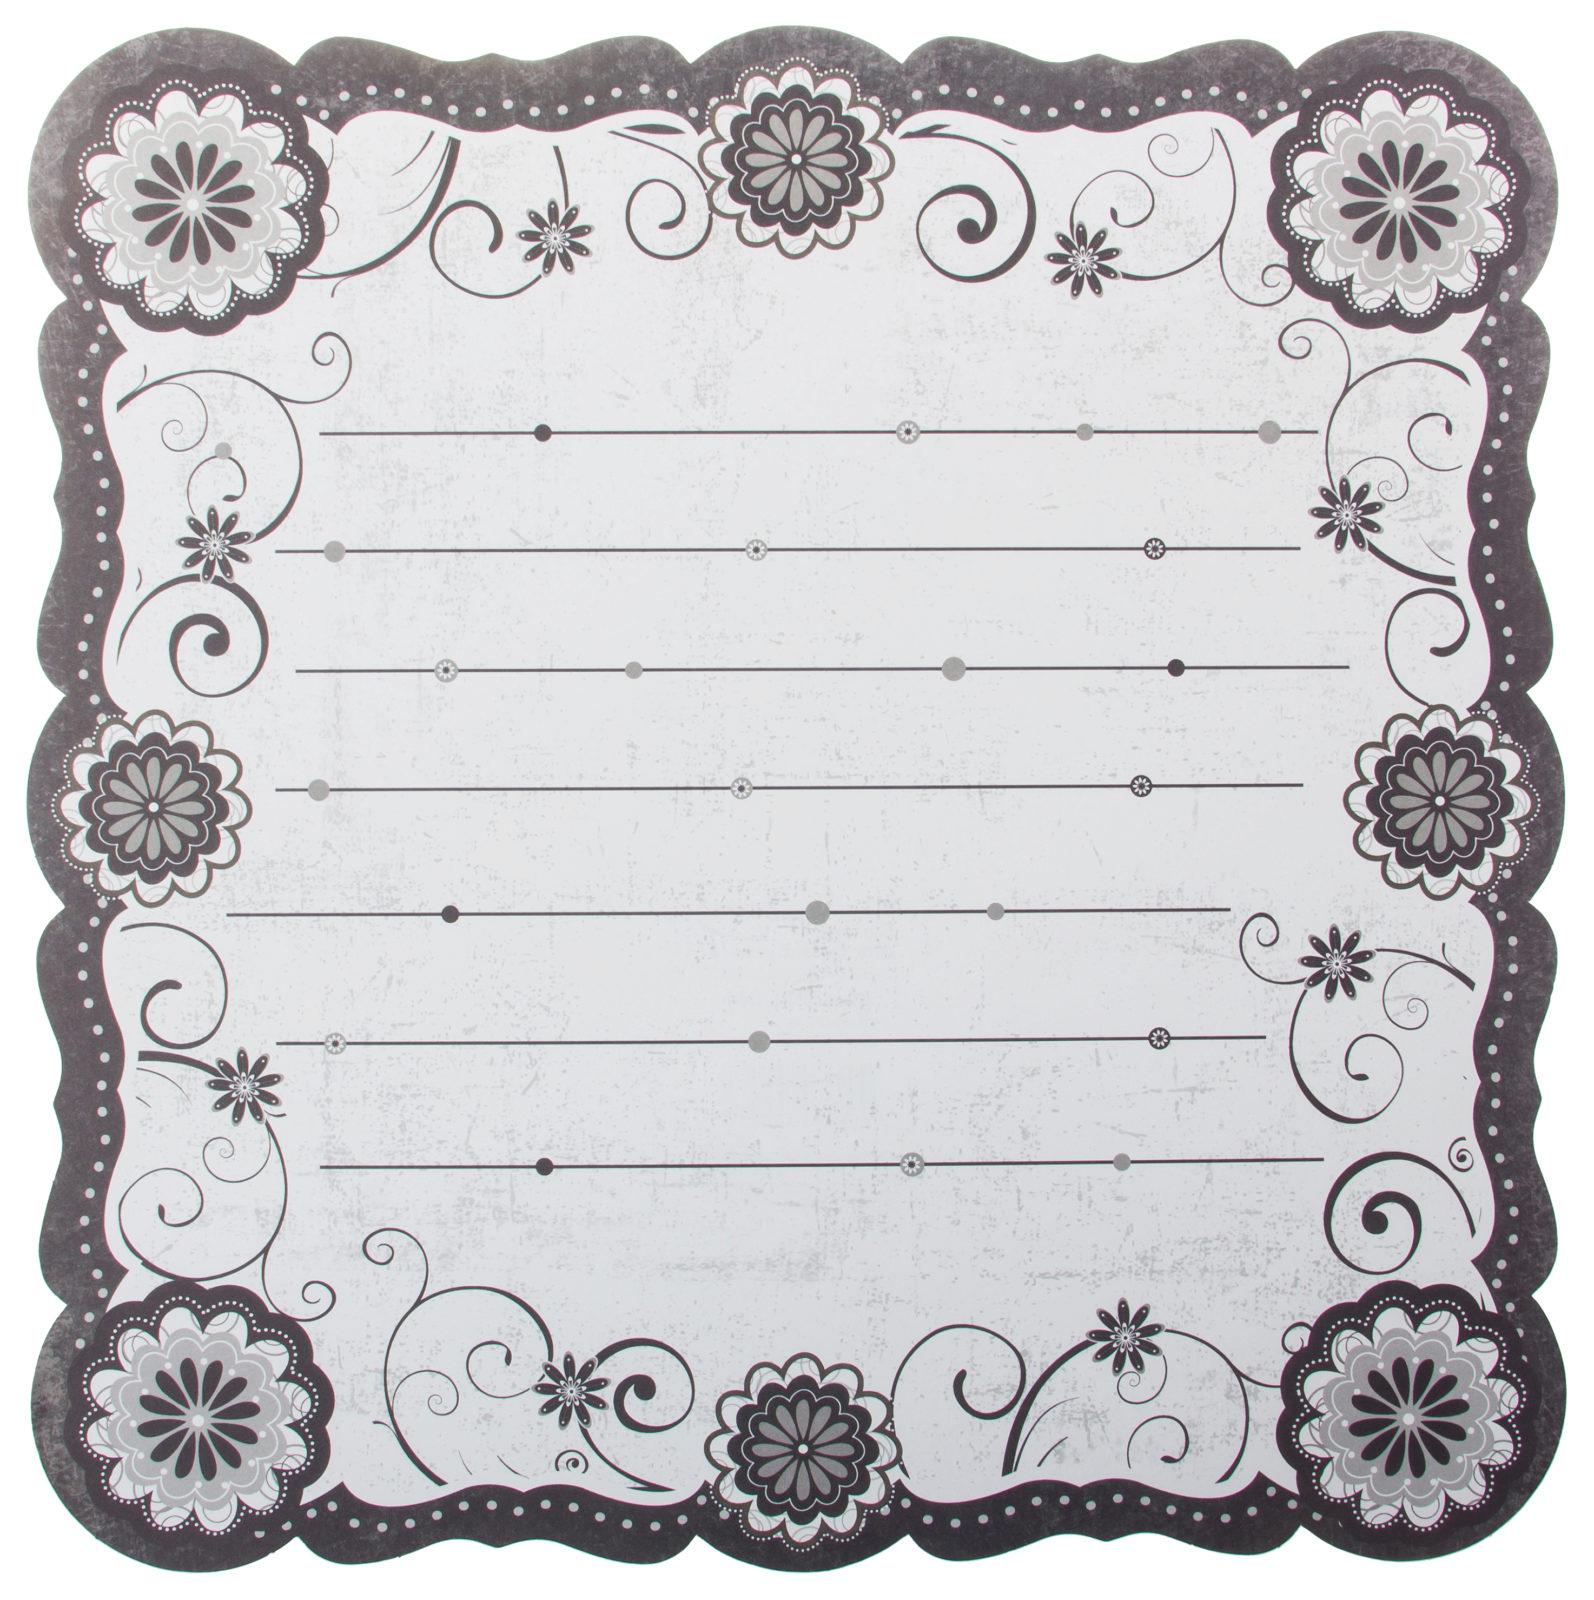 Чёрно белый шаблон для открытки